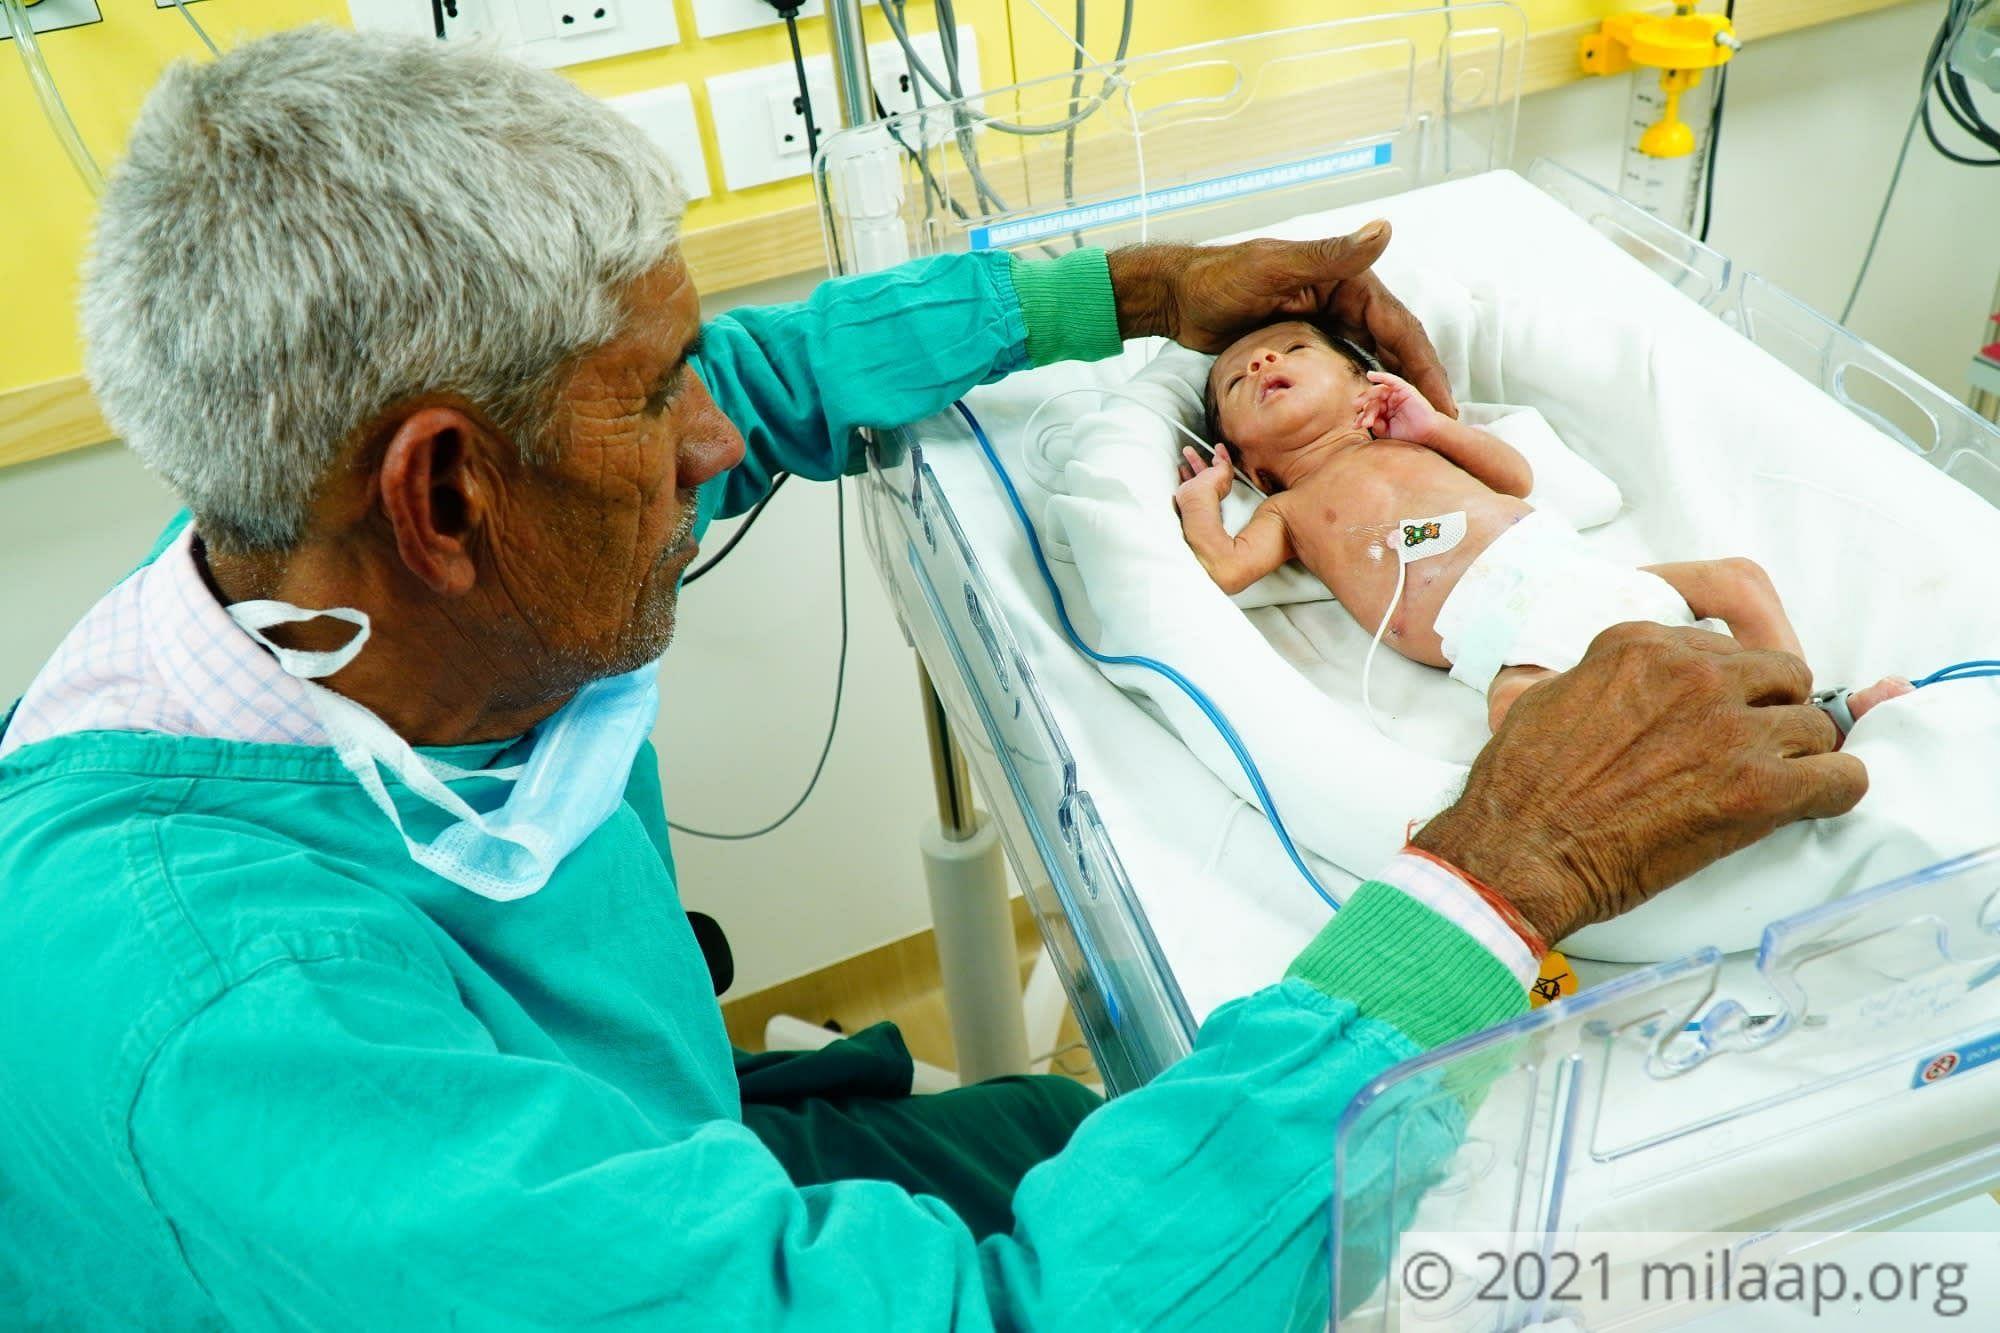 Baby of sunita 18.12 25 npbhlm 1576739974